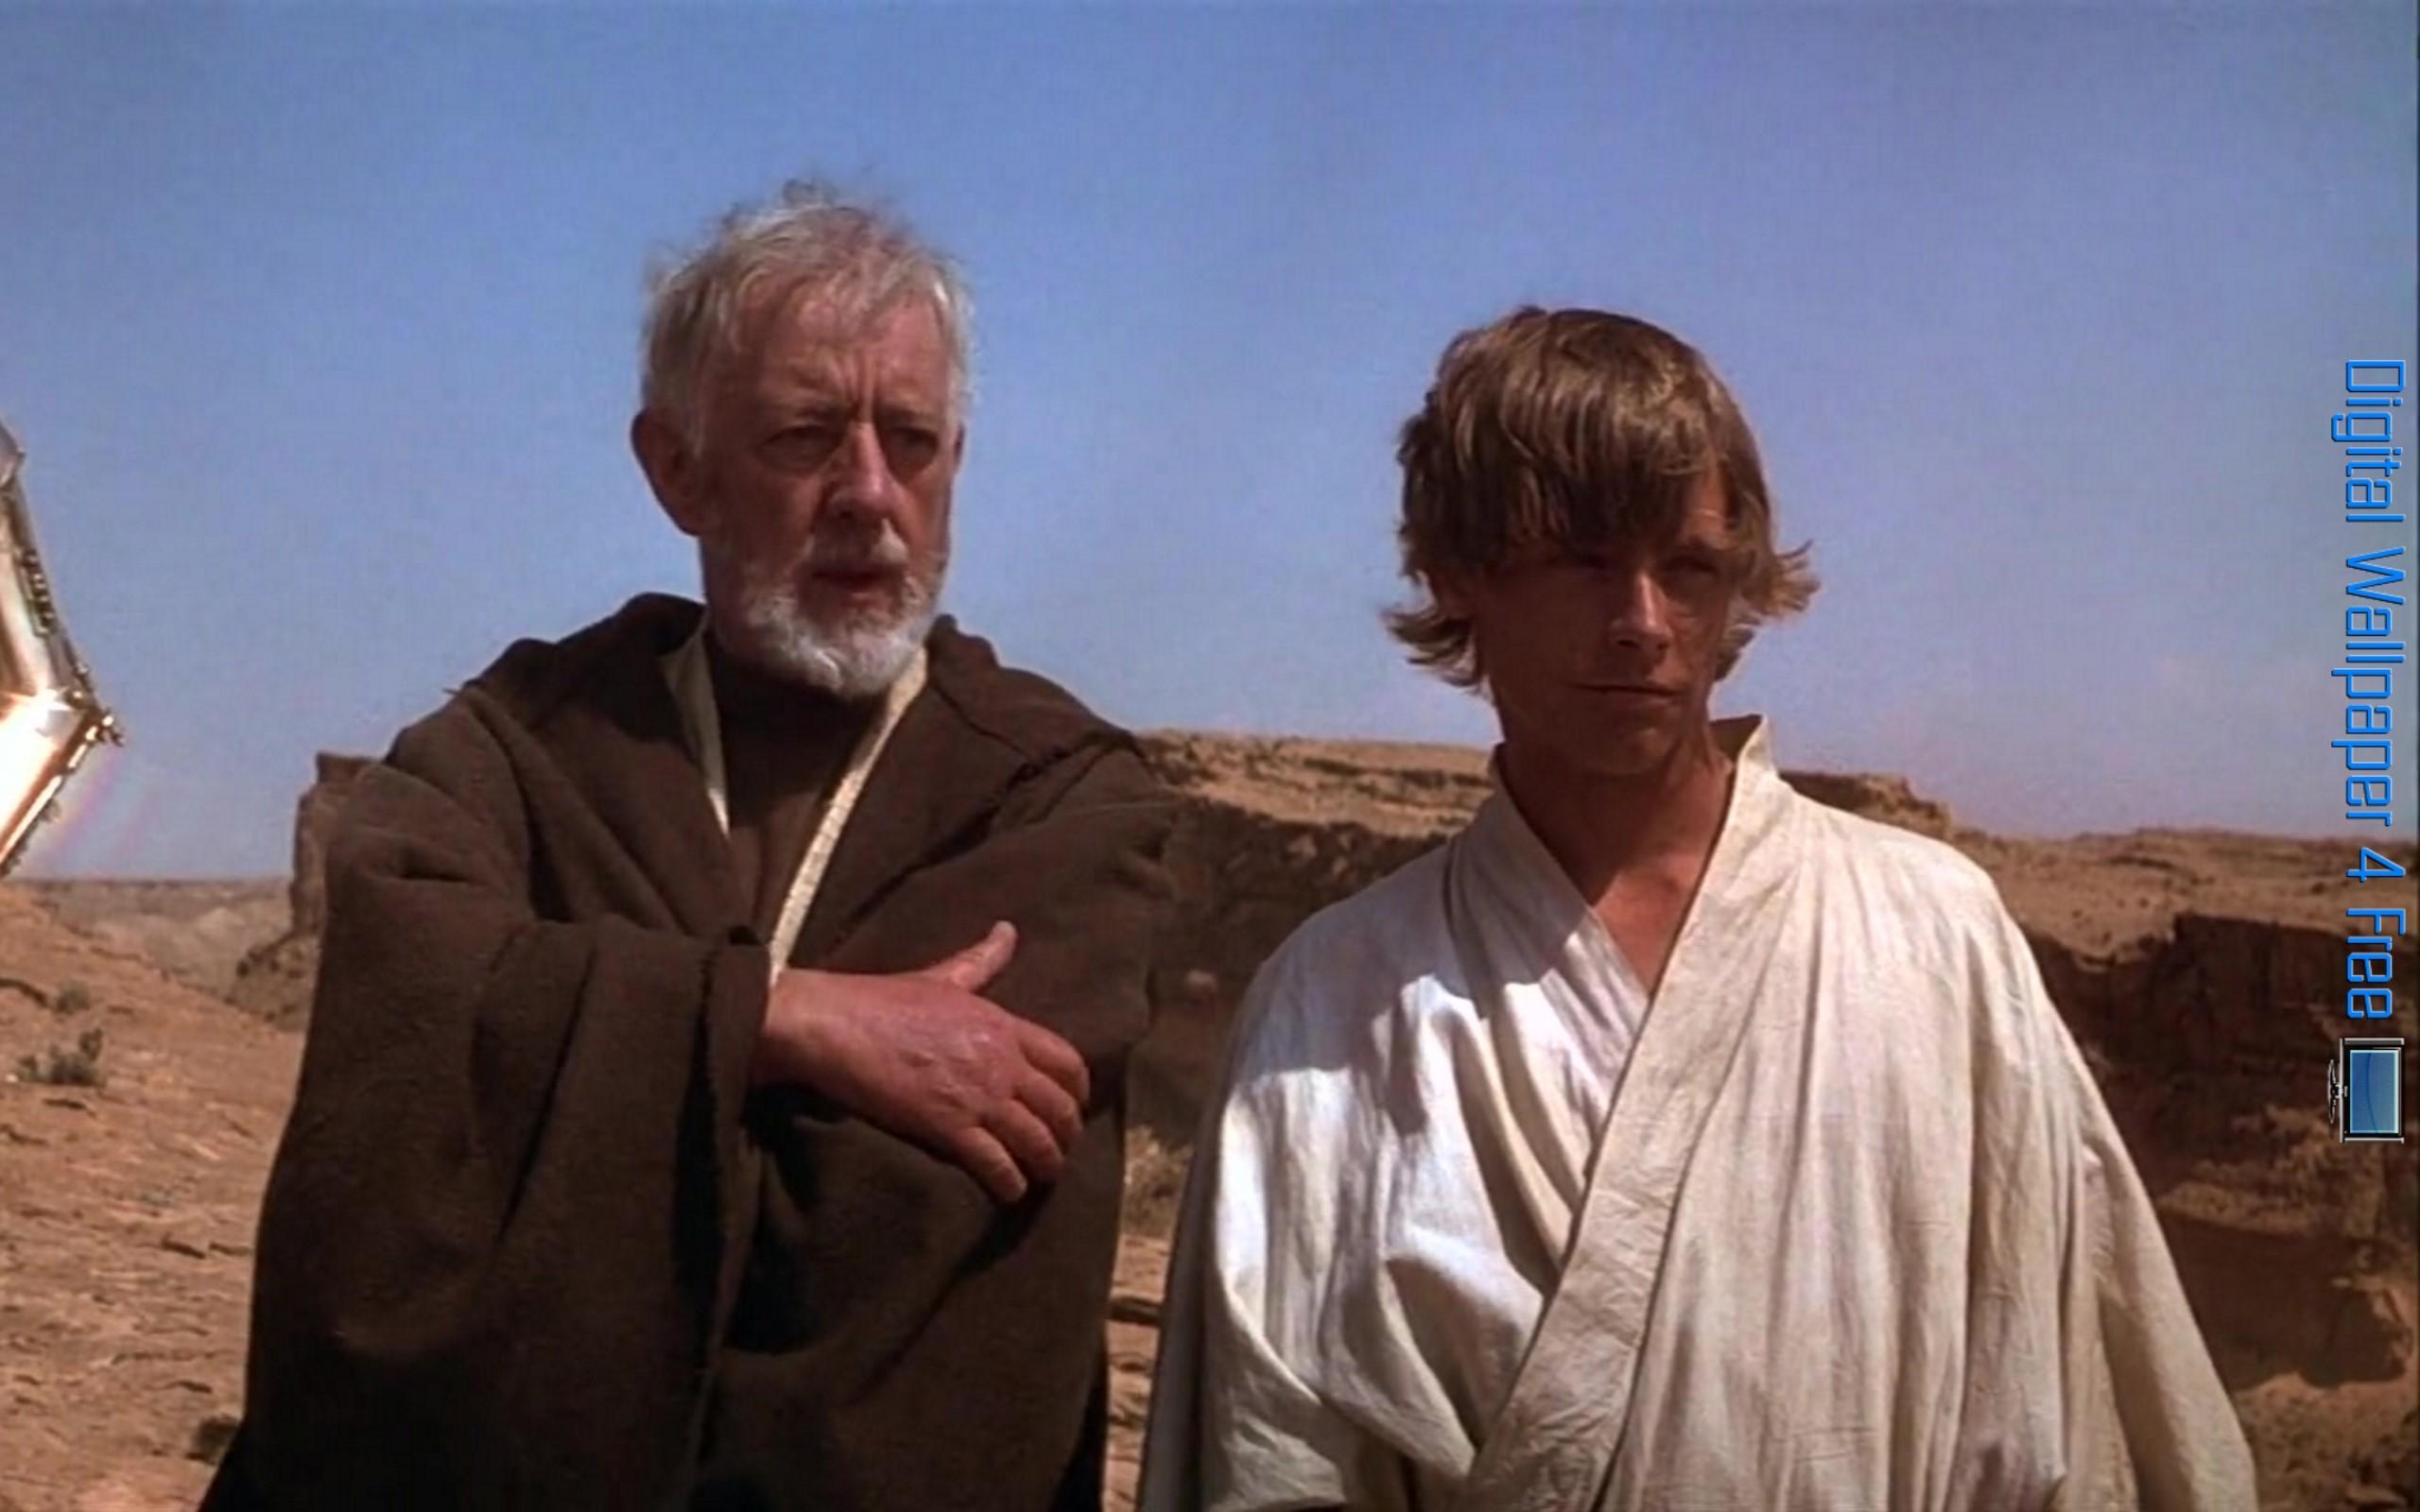 Star Wars Episode 4 Obi Wan Kenobi And Luke Skywalker 002 – Digital  Wallpaper 4 Free